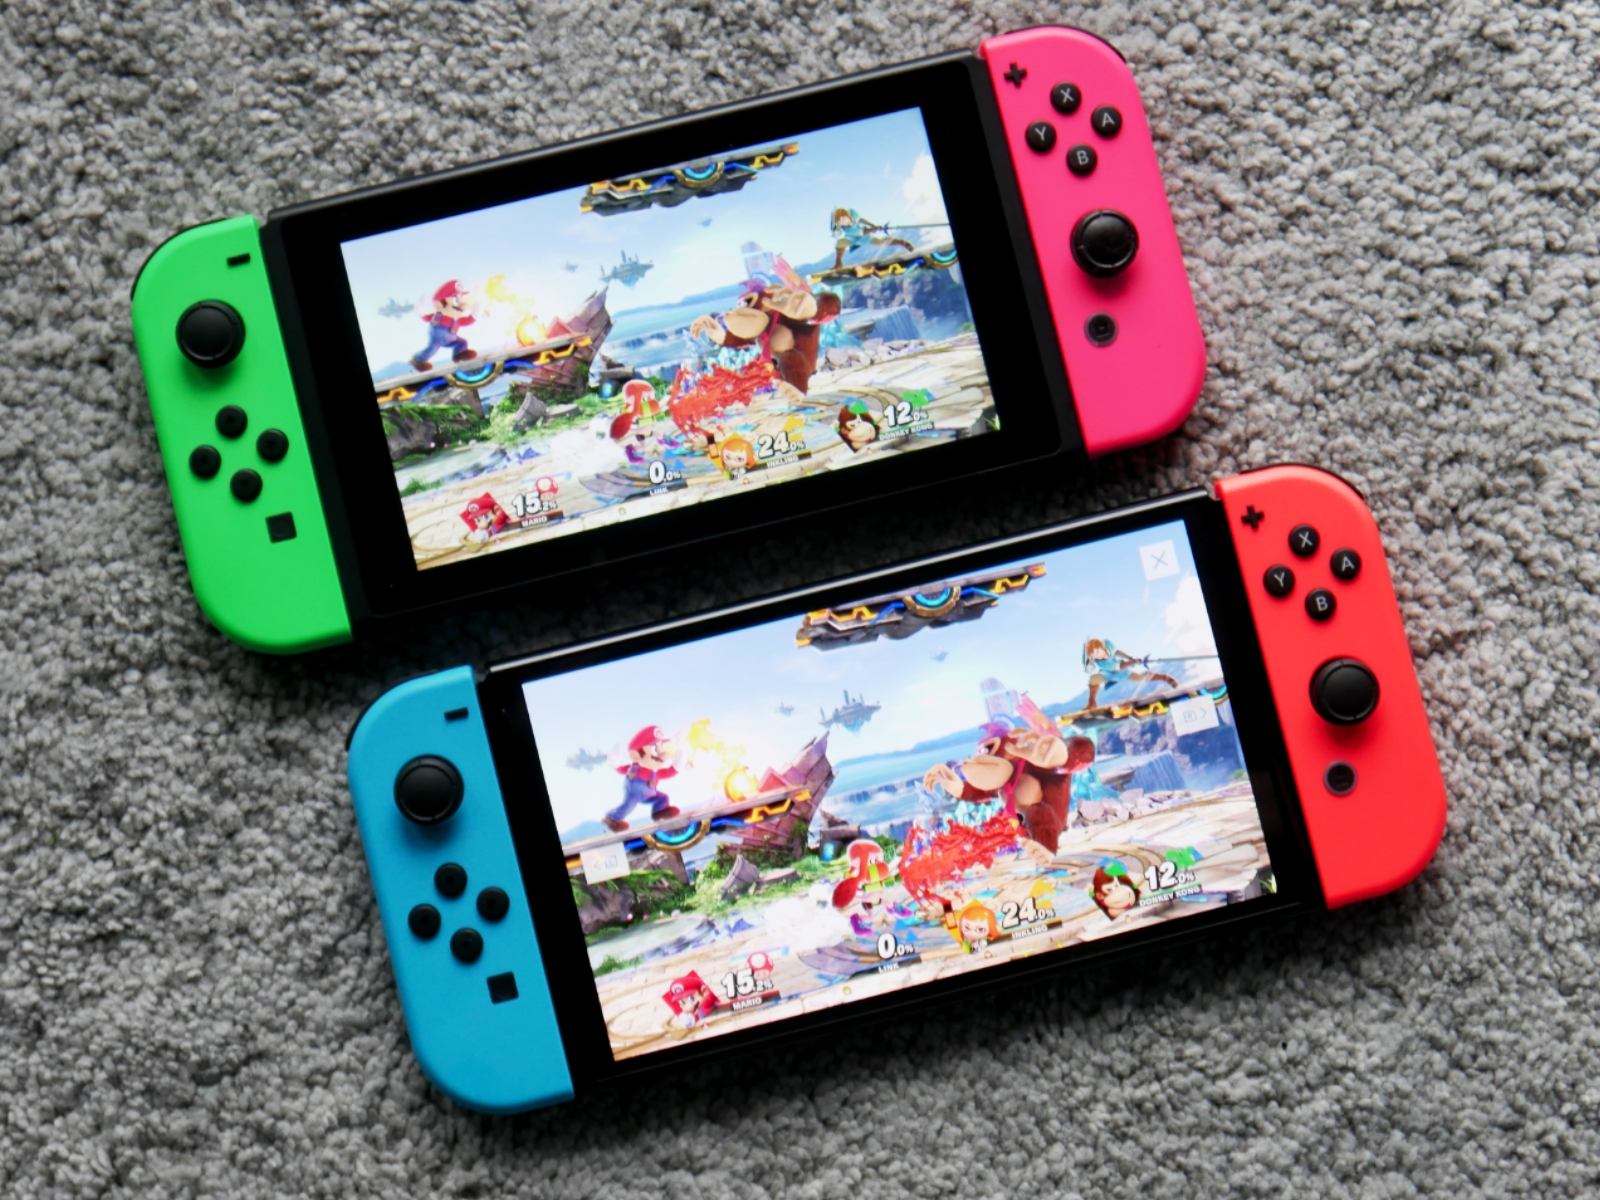 Nintendo Switch Oled Vergleich